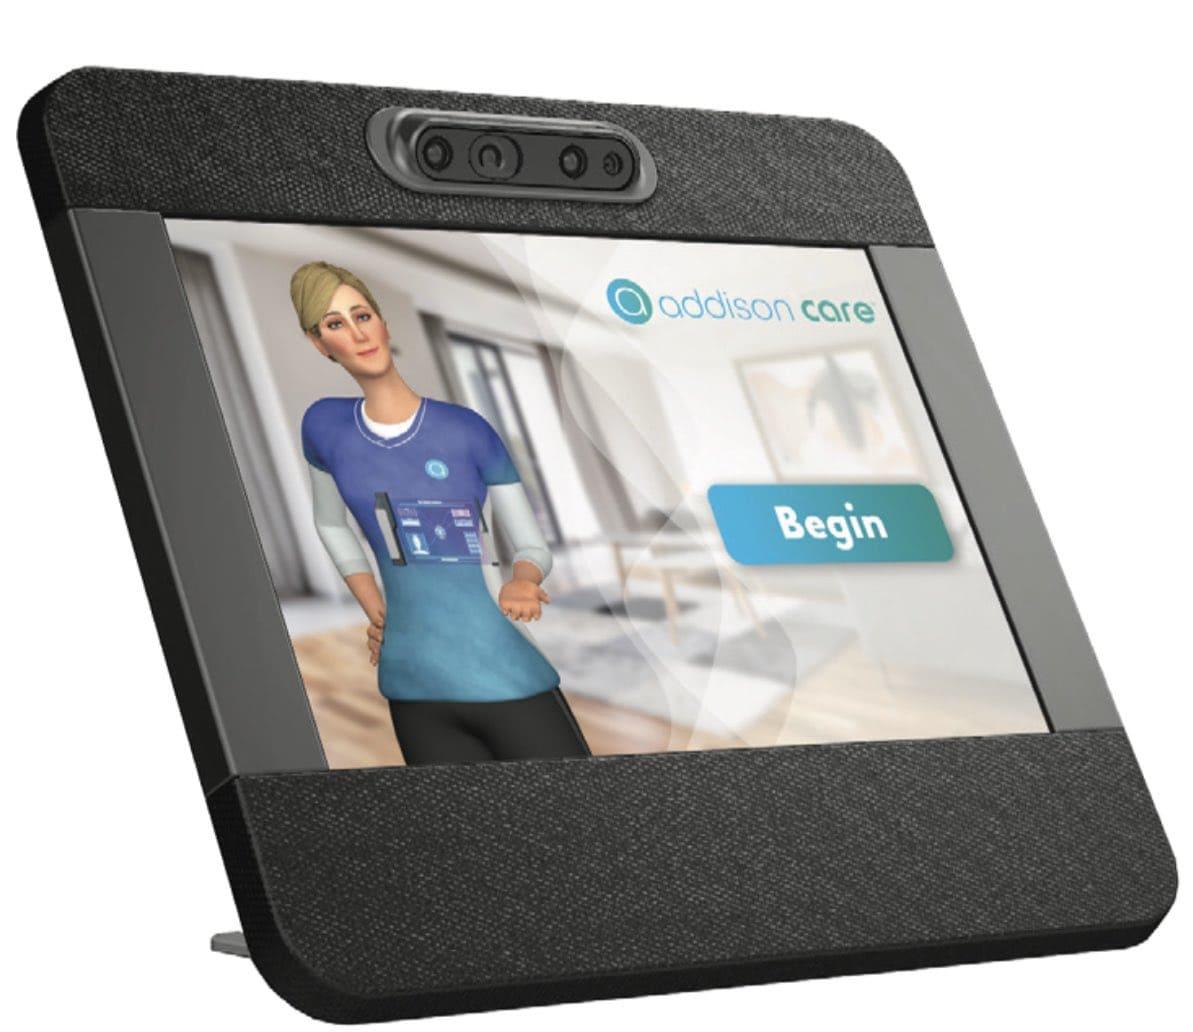 Addison Care with Intel RealSense Cameras